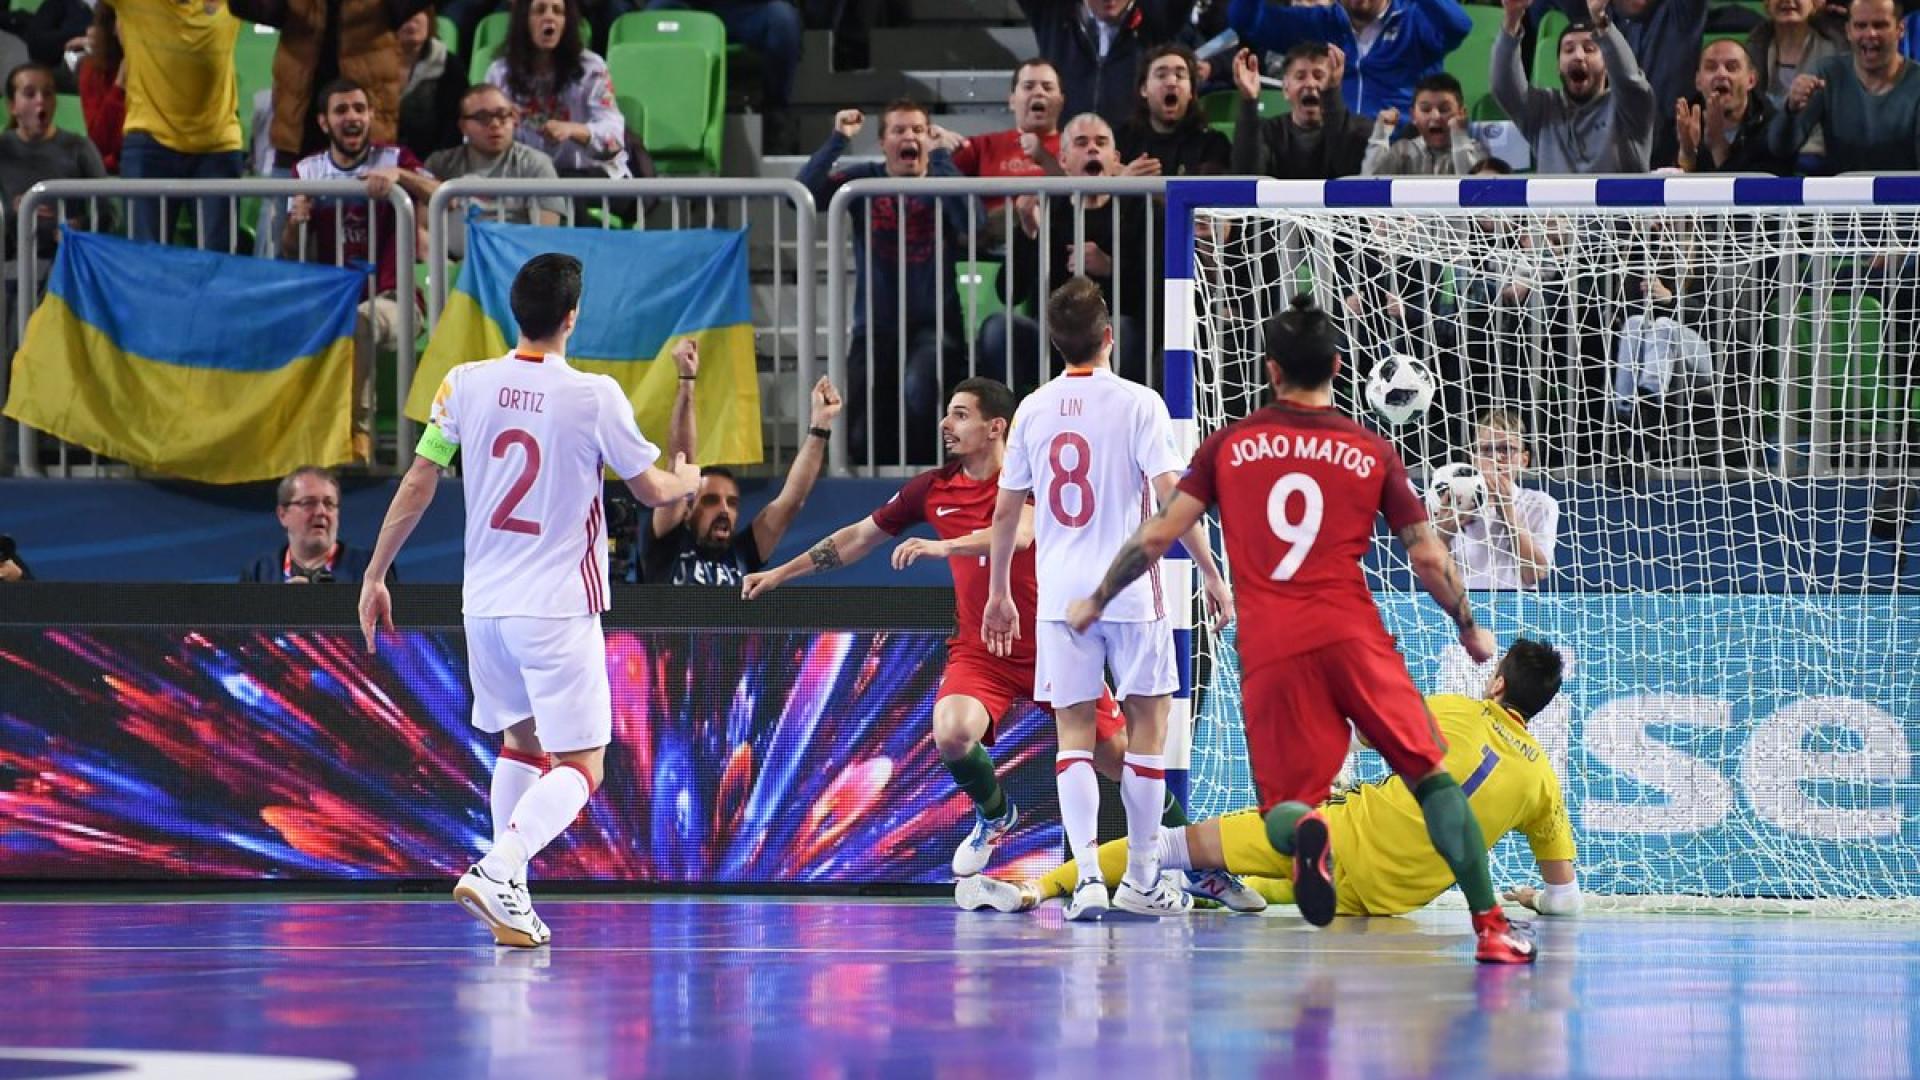 Futsal: As novas regras que podem mudar a modalidade